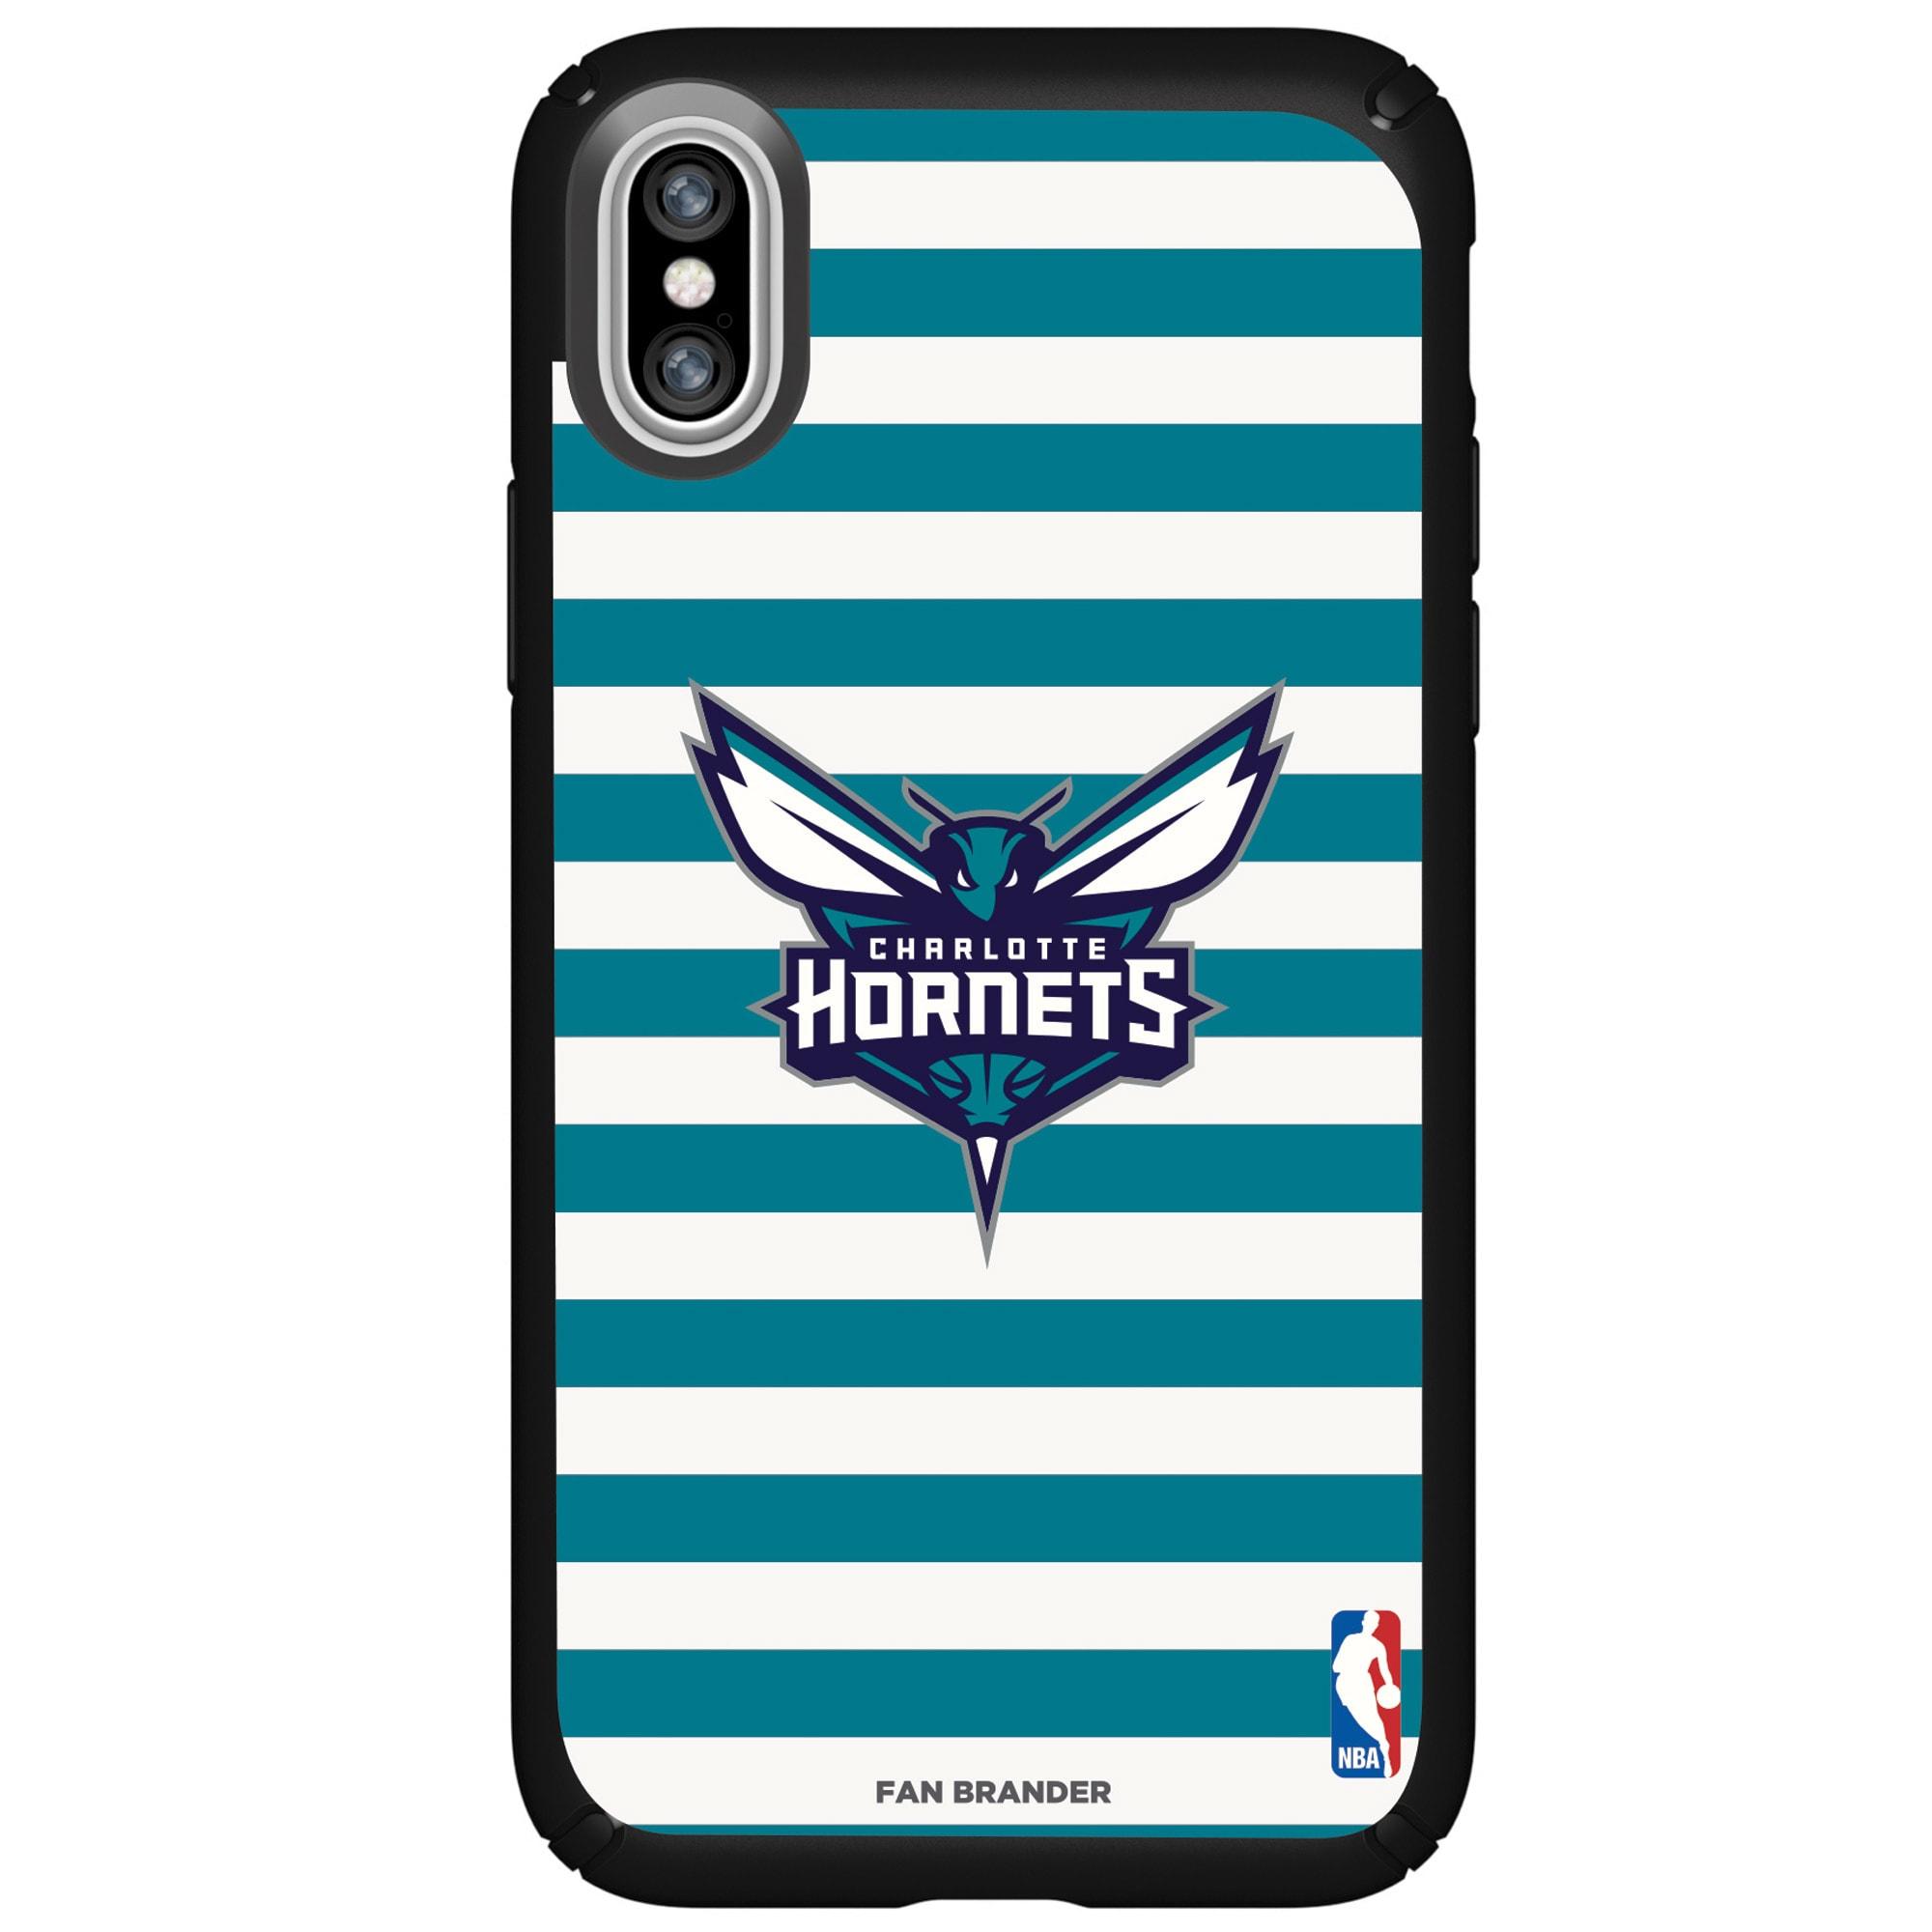 Charlotte Hornets Speck iPhone Presidio Striped Design Case